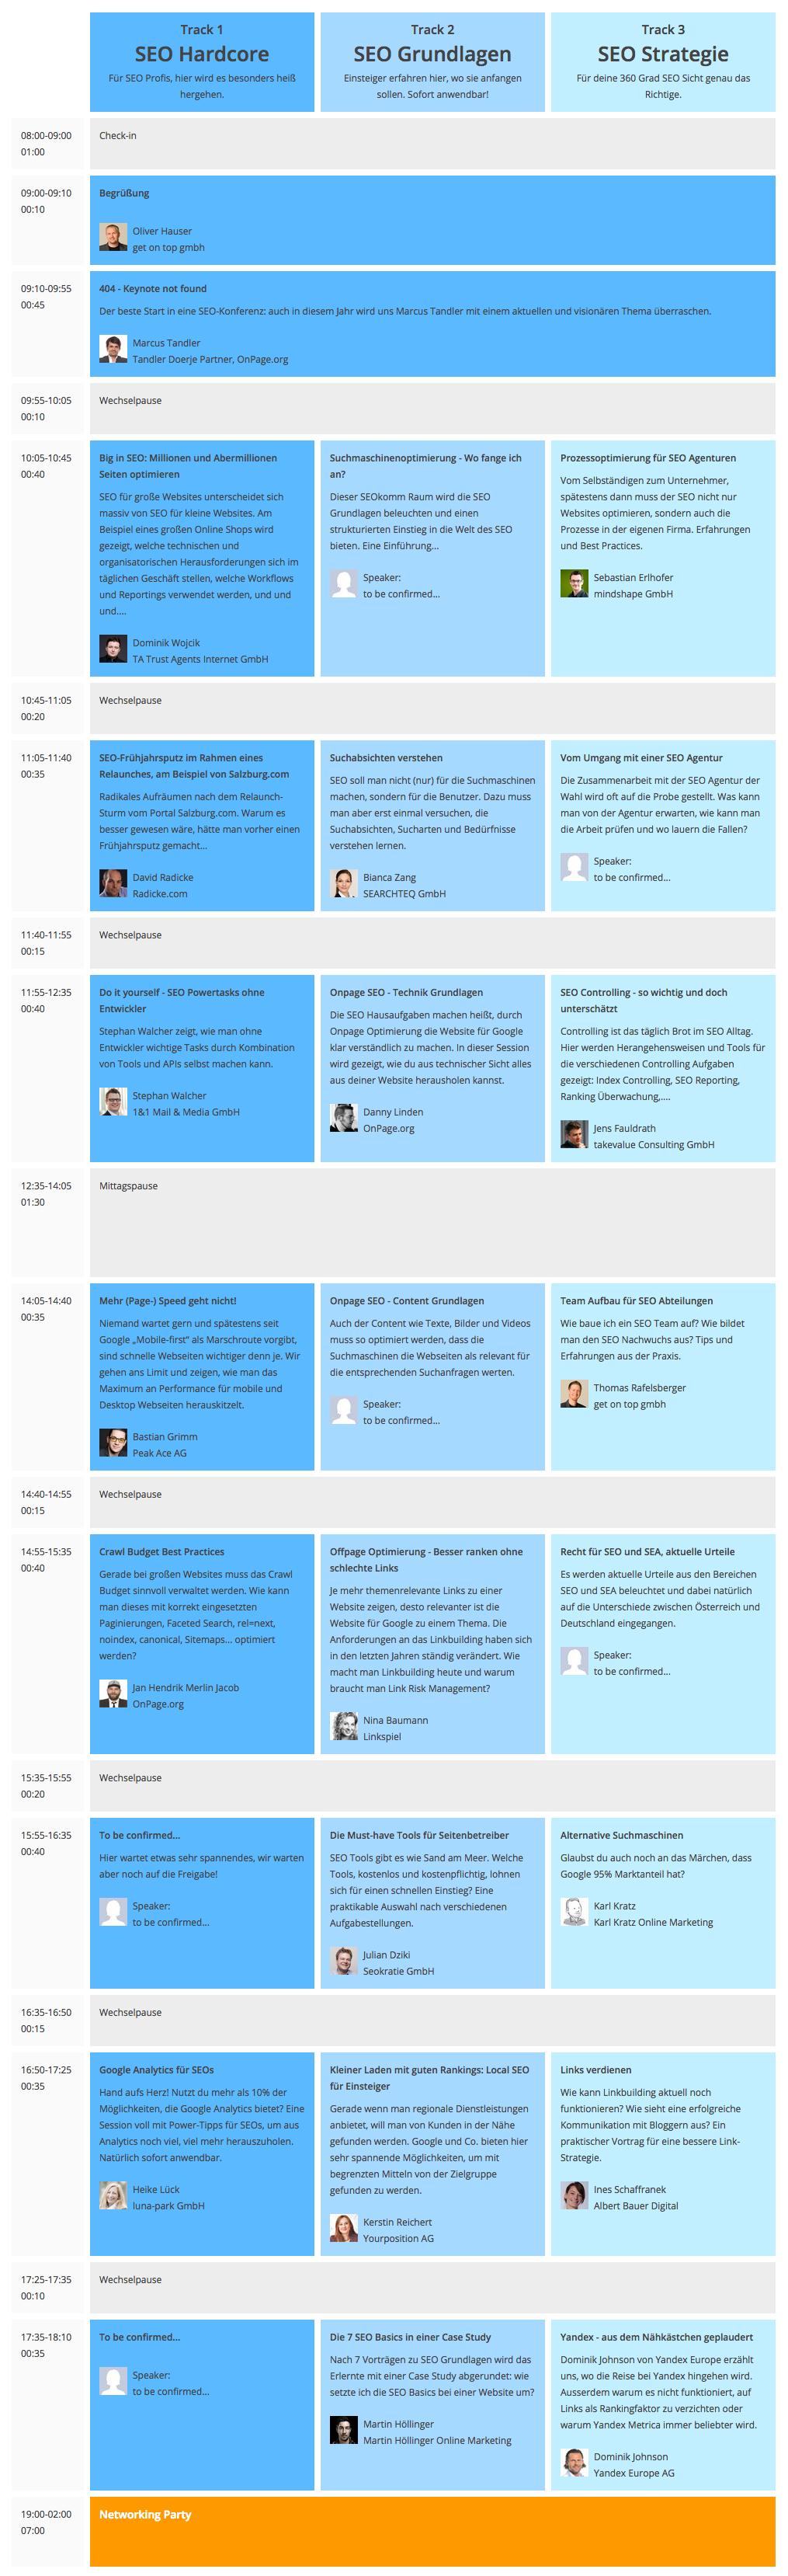 SEOkomm Agenda 2015, Stand 20150615